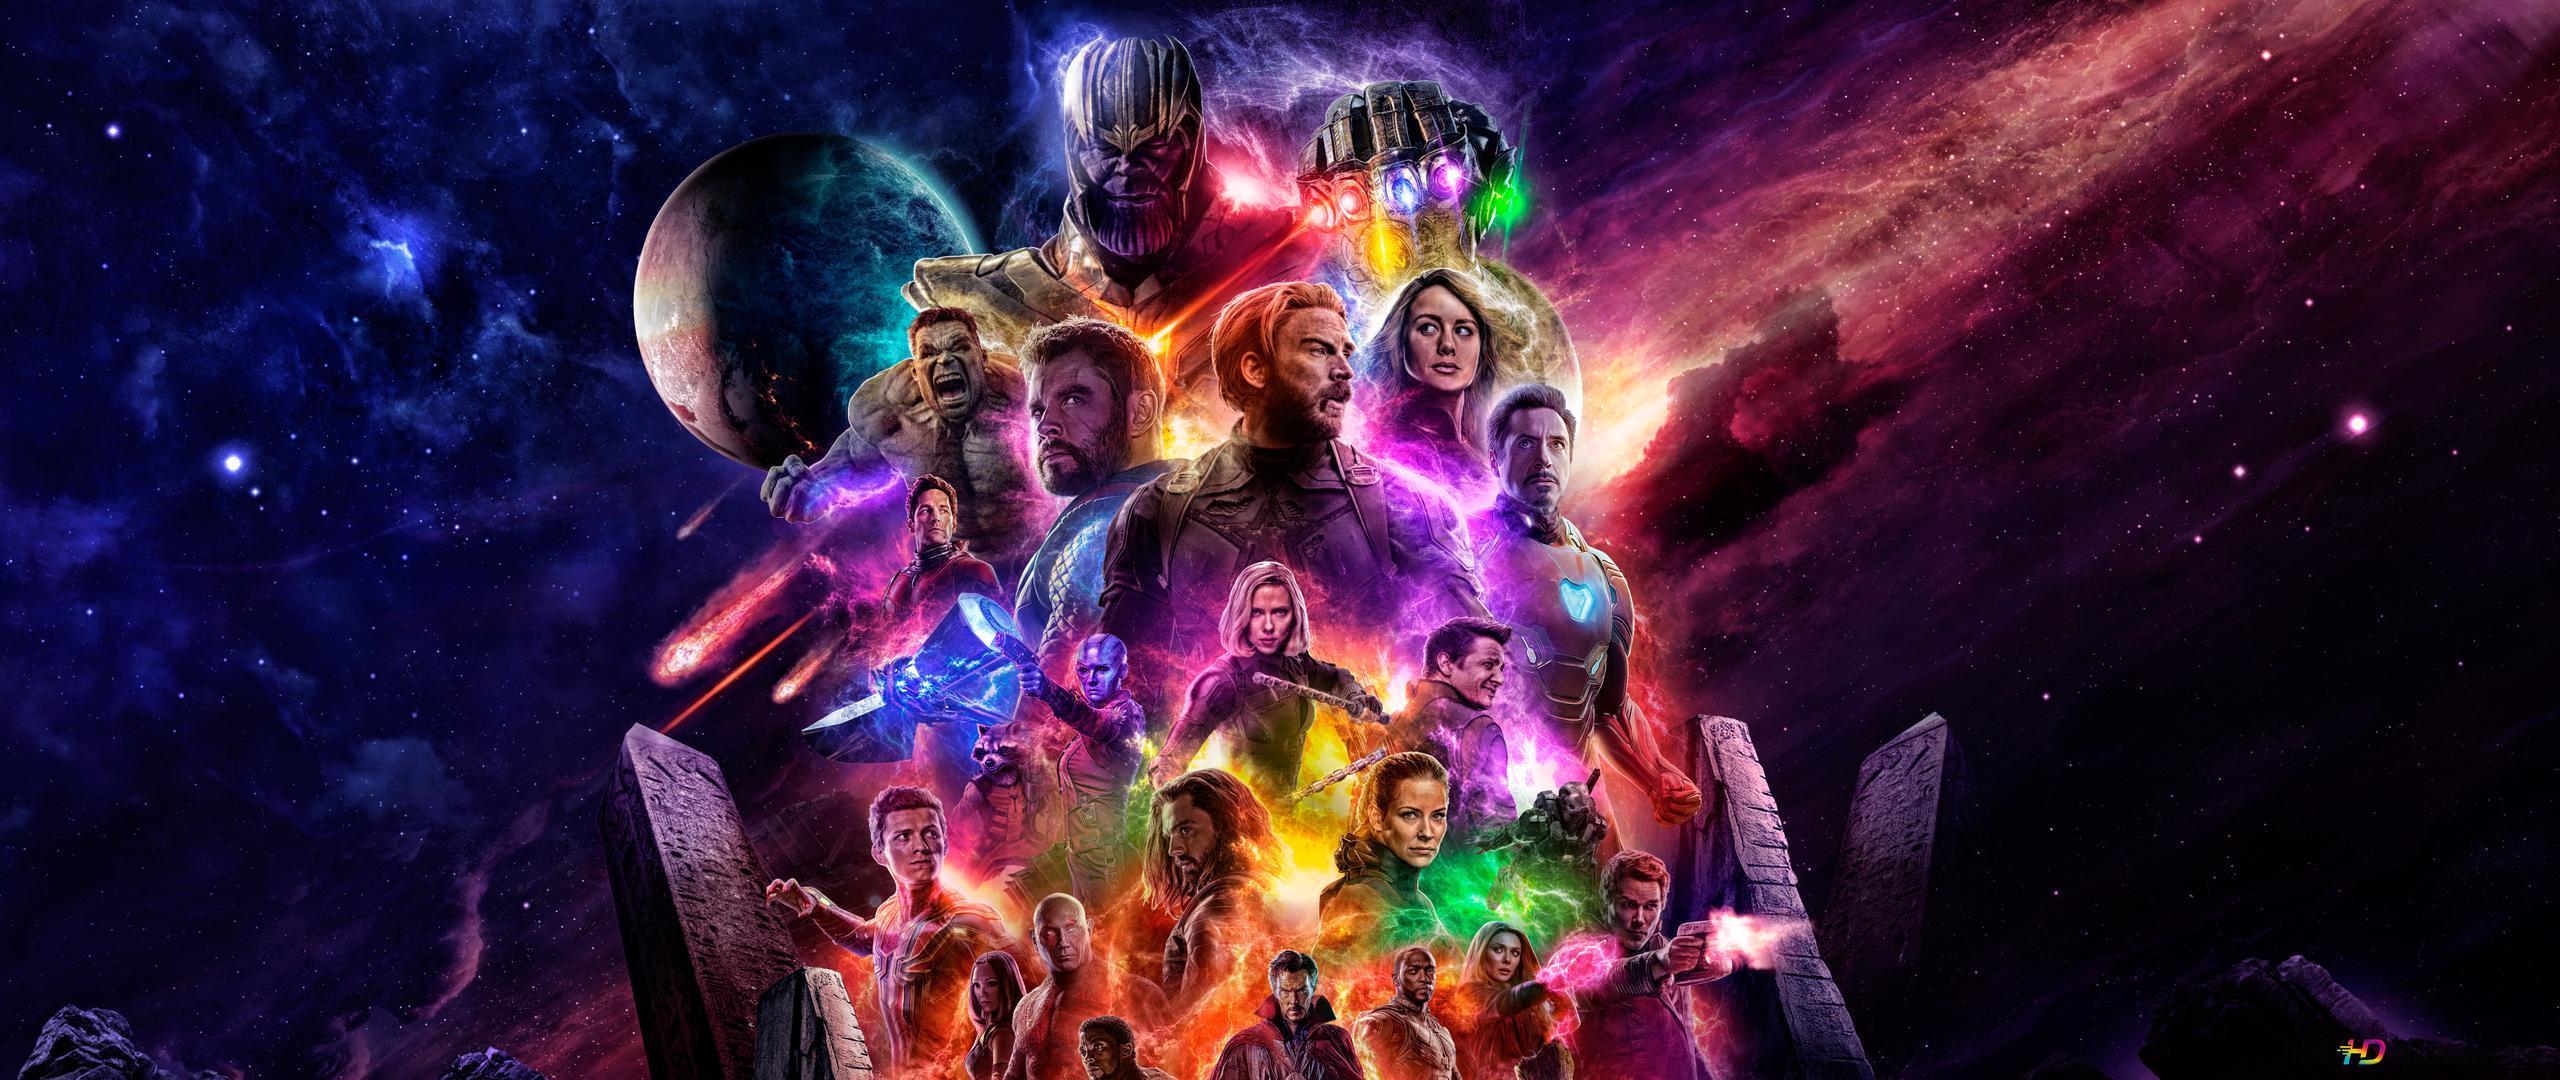 Avengers Endgame Hd Fond D Ecran Telecharger